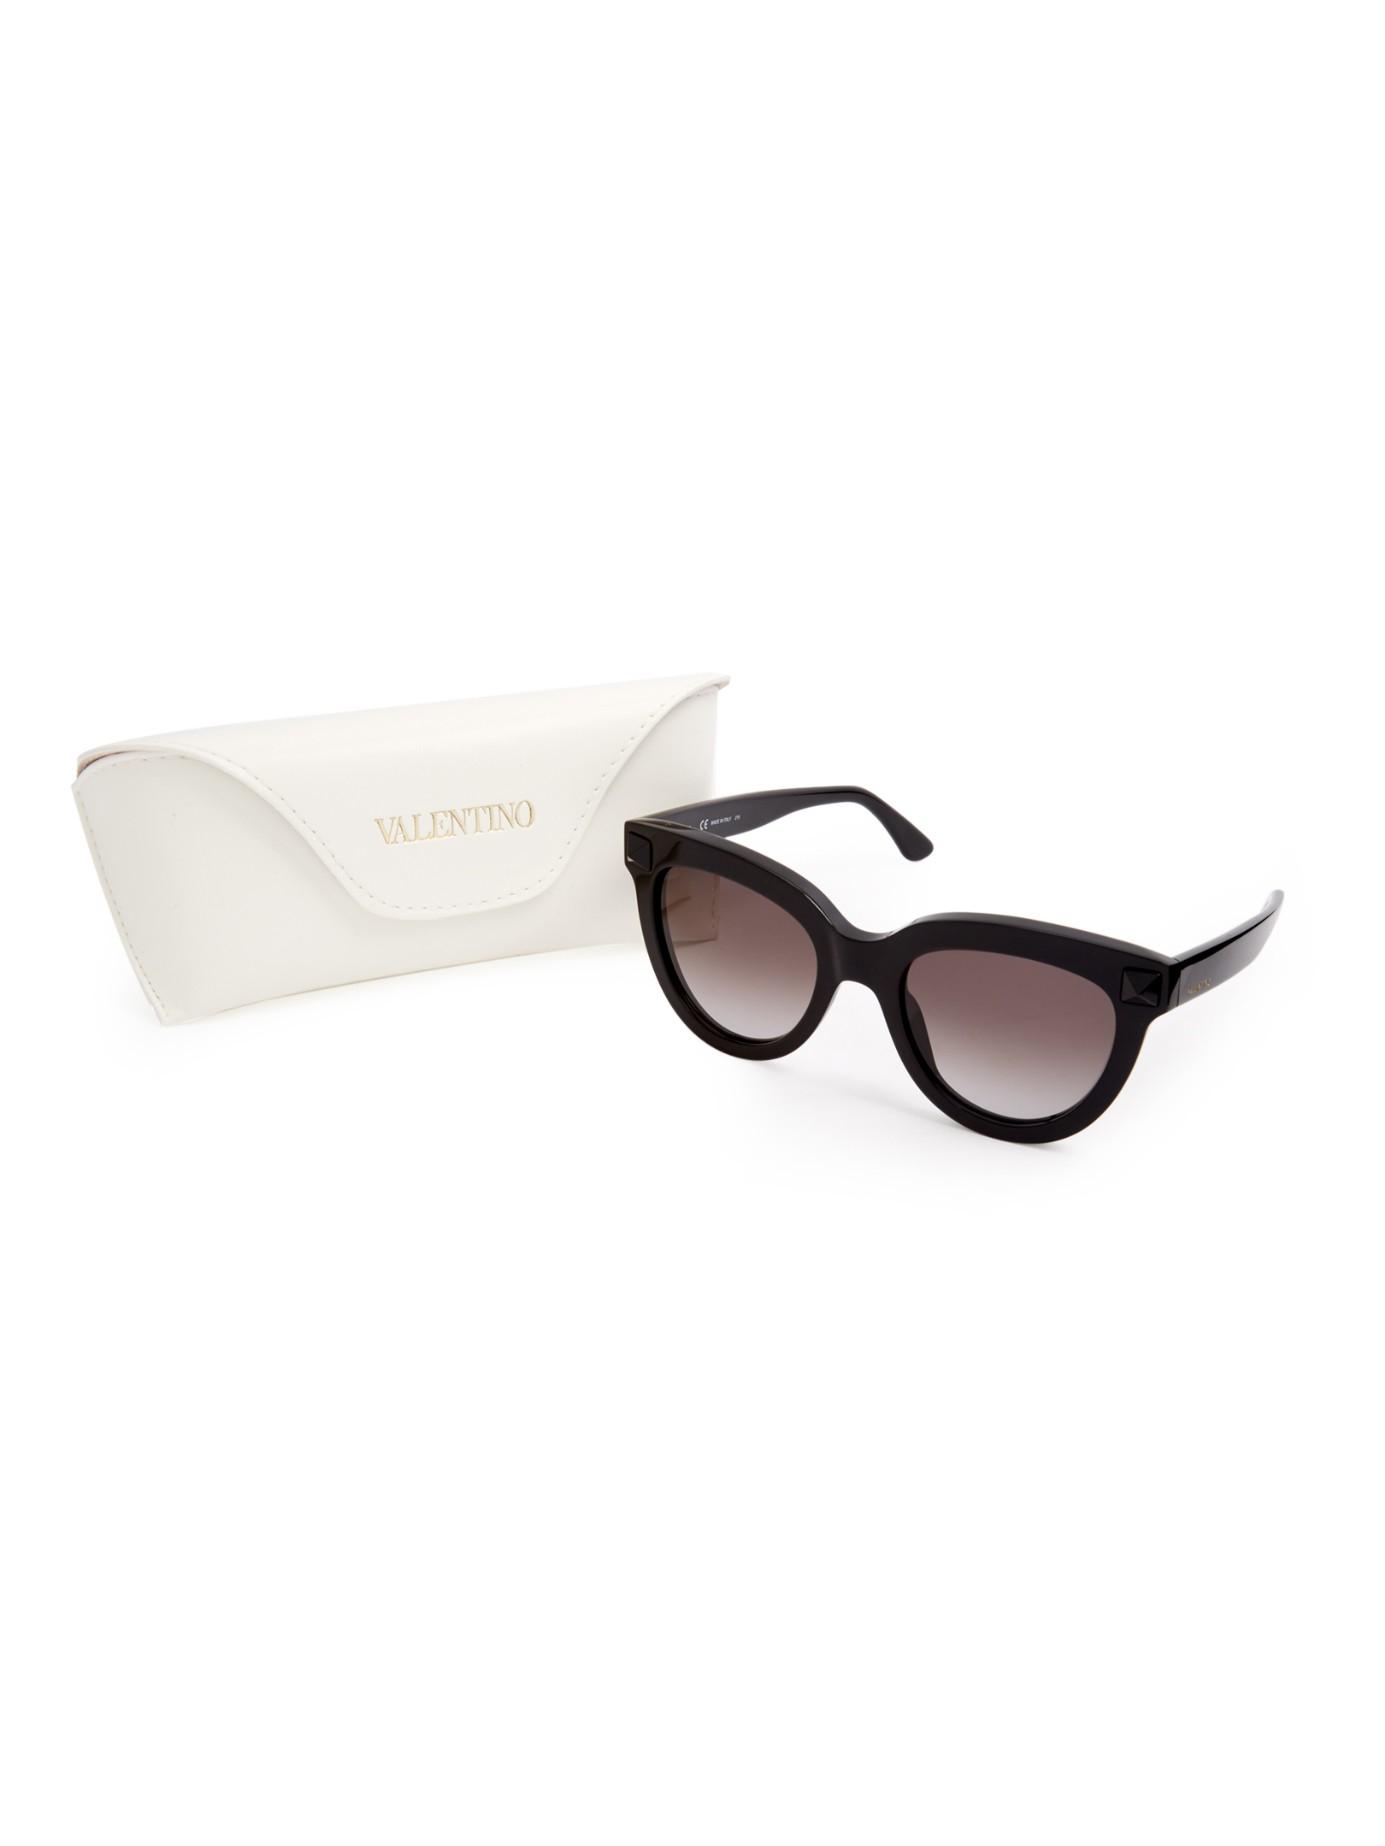 fd4a6abd2618 Valentino Rockstud Cat-eye Frame Sunglasses in Black - Lyst